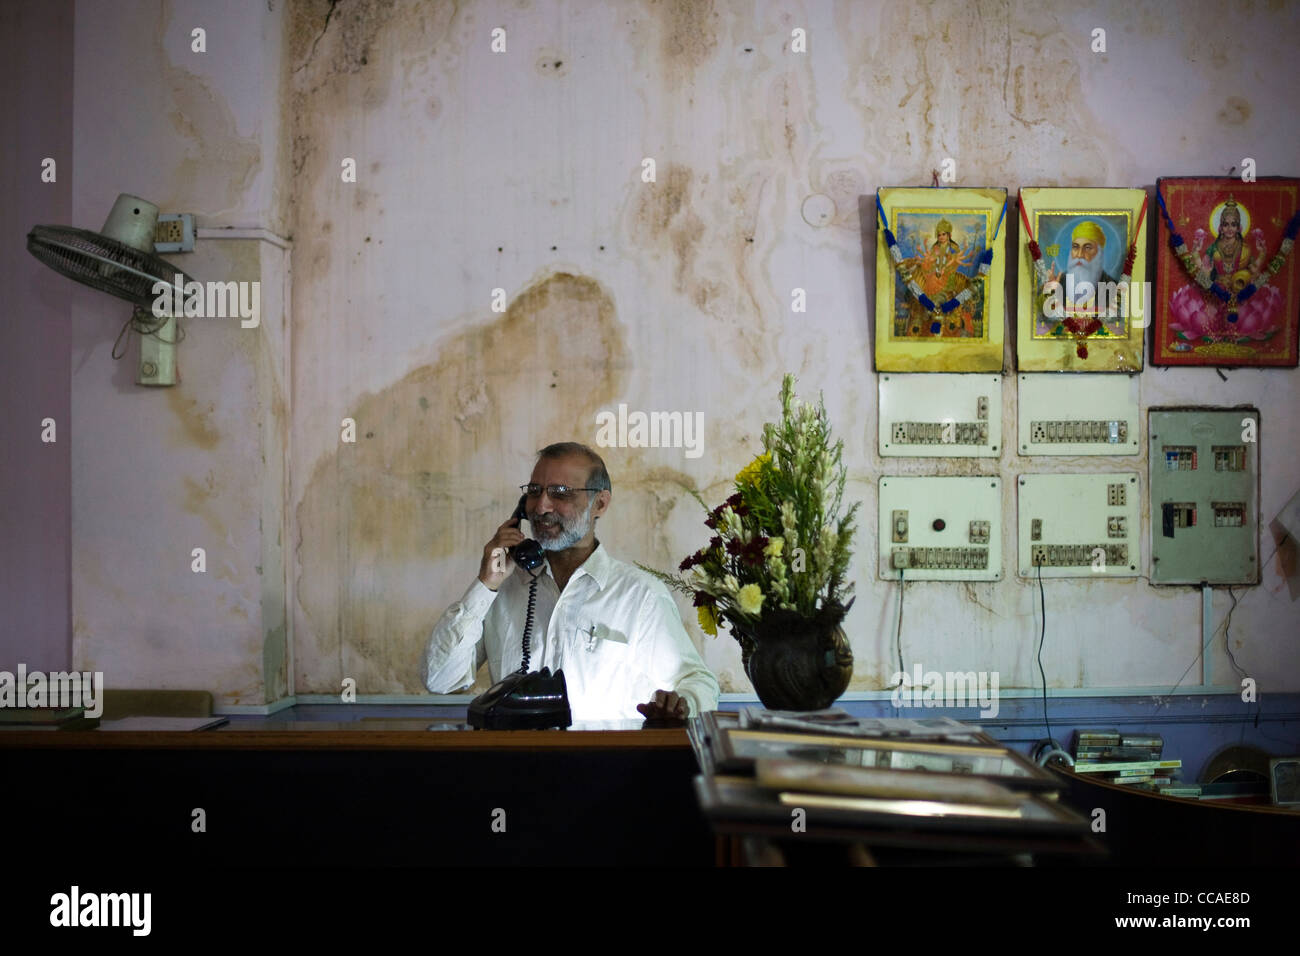 Mukesh Joshi, the manager at Moti Mahal Restaurant in Old Delhi, India - Stock Image